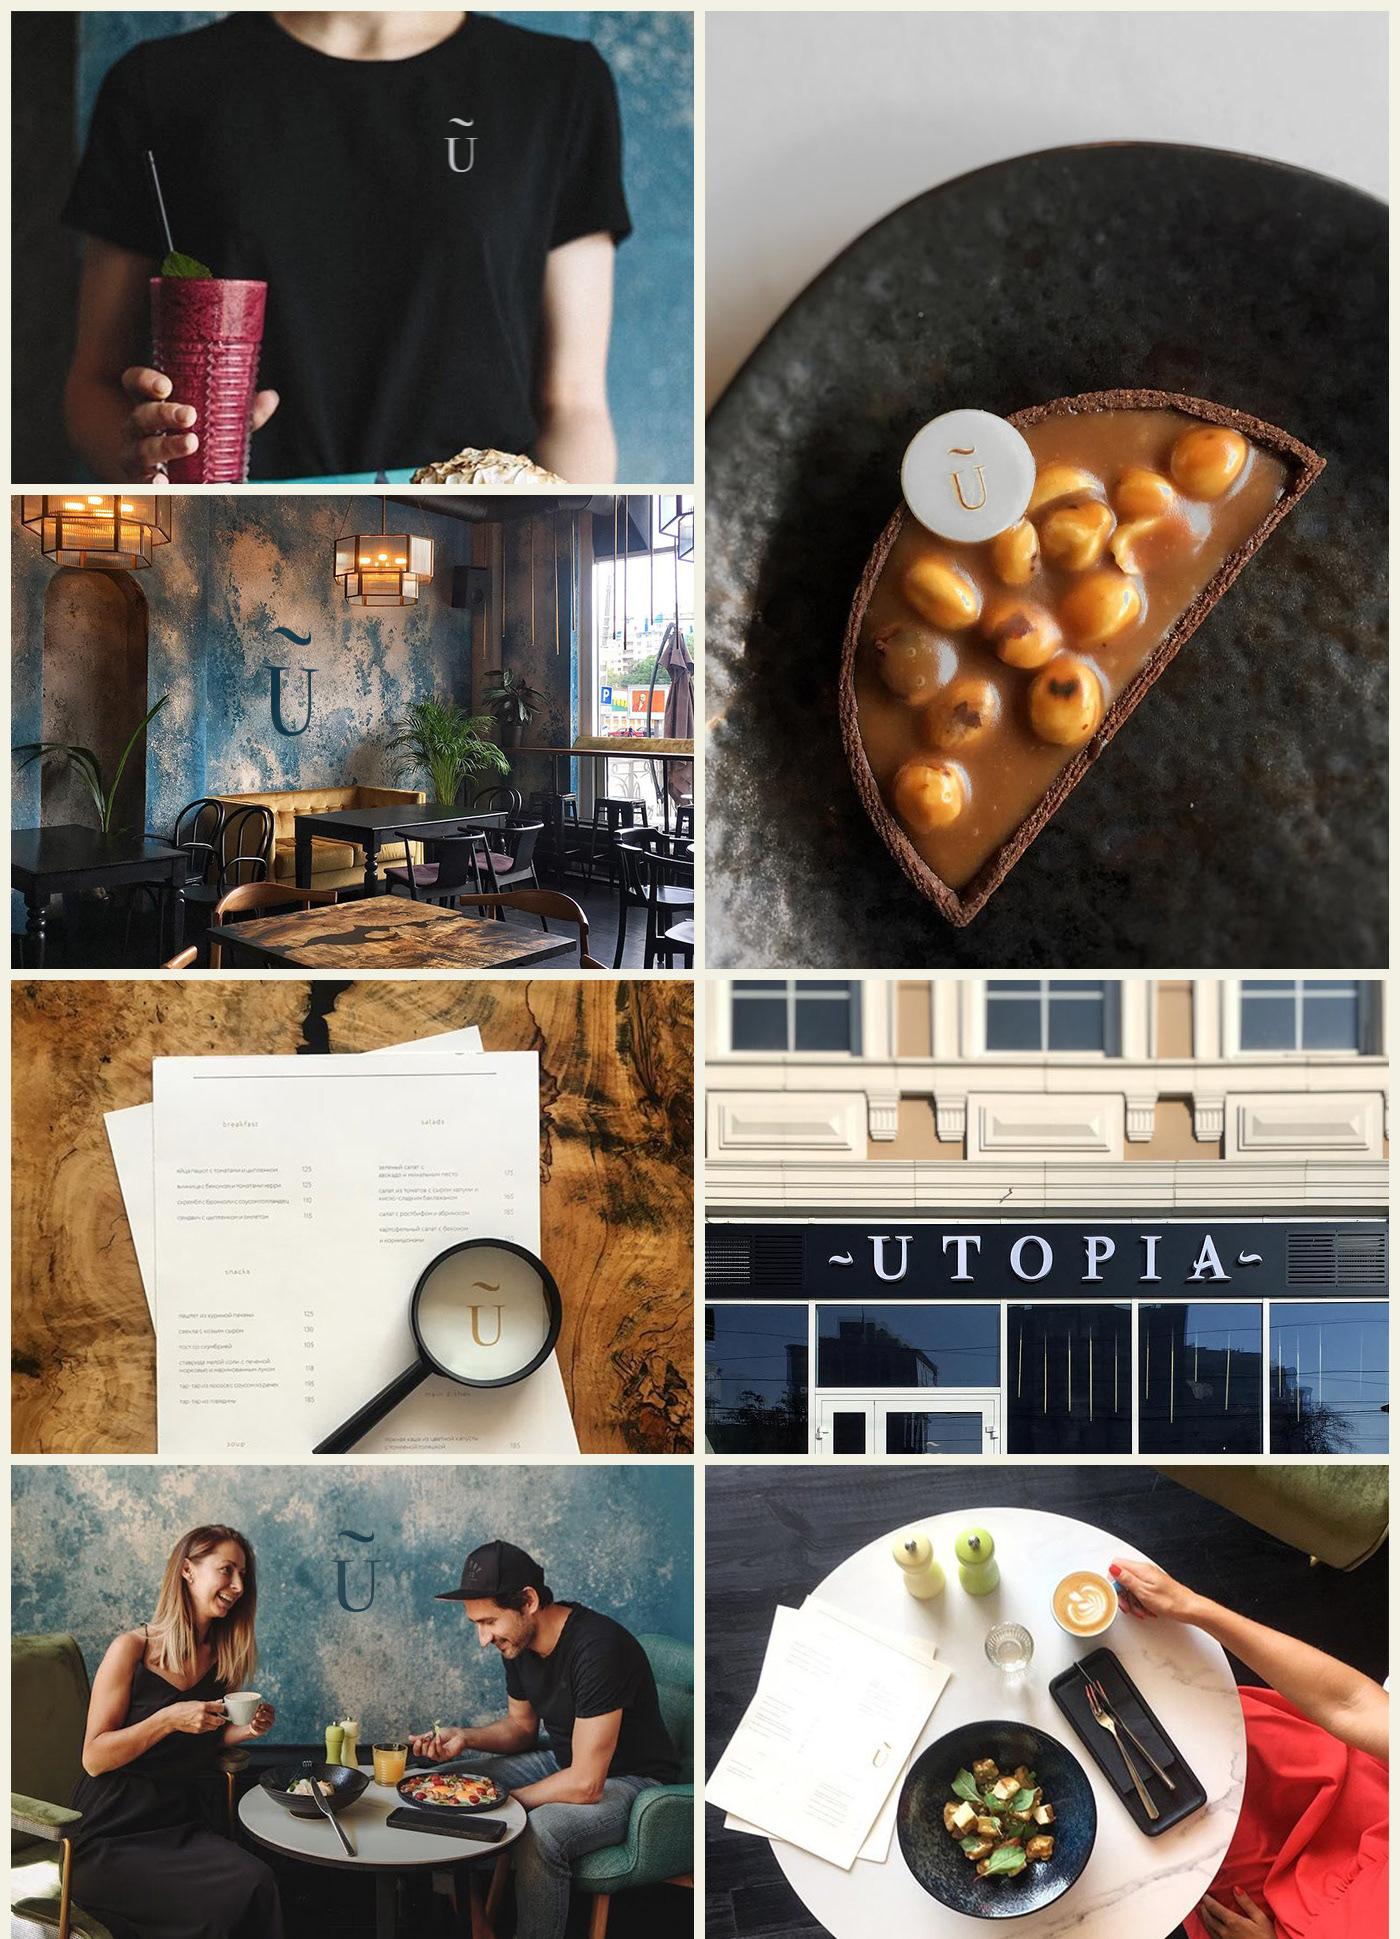 cafe teahouse Coffee creative art pastry restaurant branding  identity logo